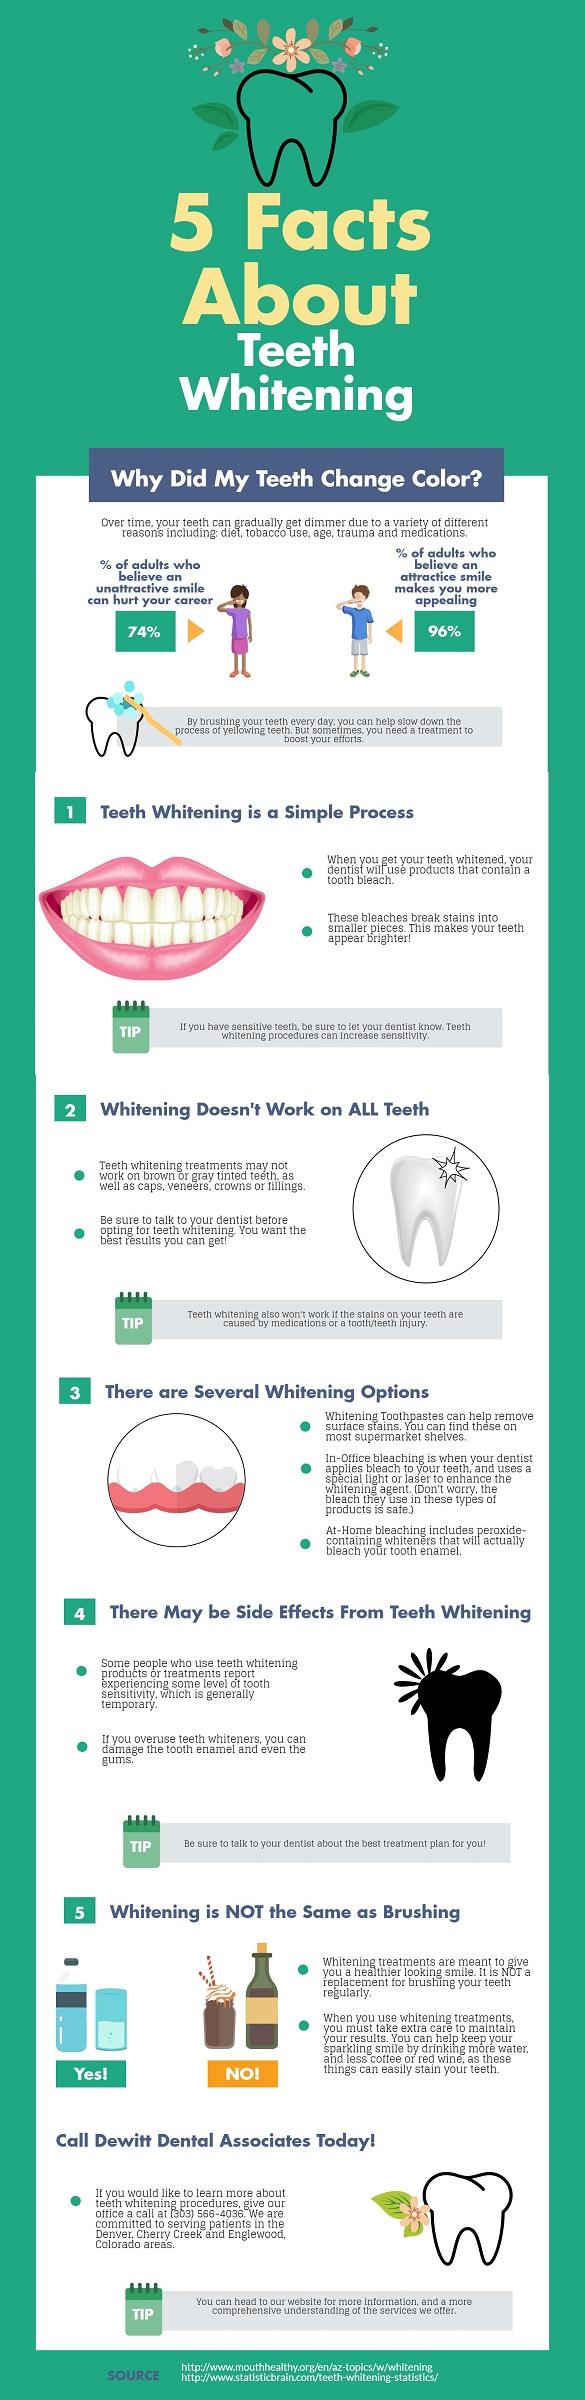 DeWitt Dental Associates image 3